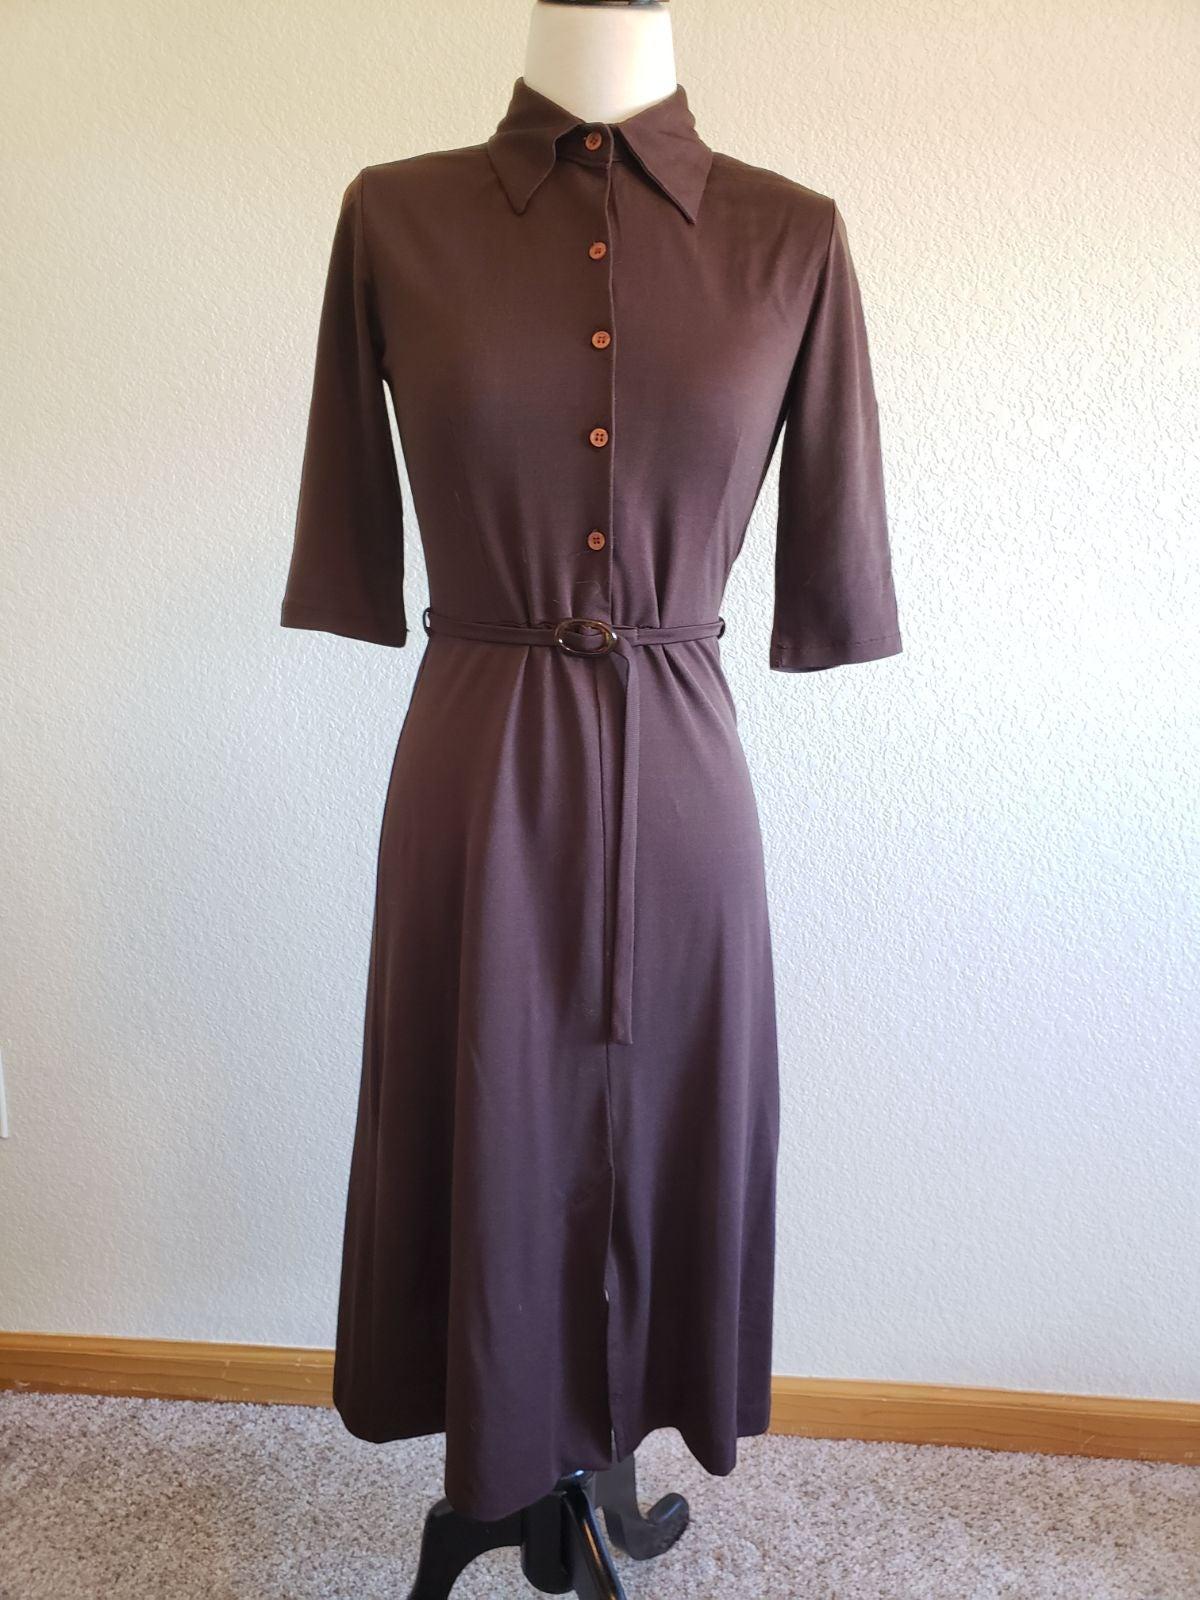 1970s brown button up vintage dress